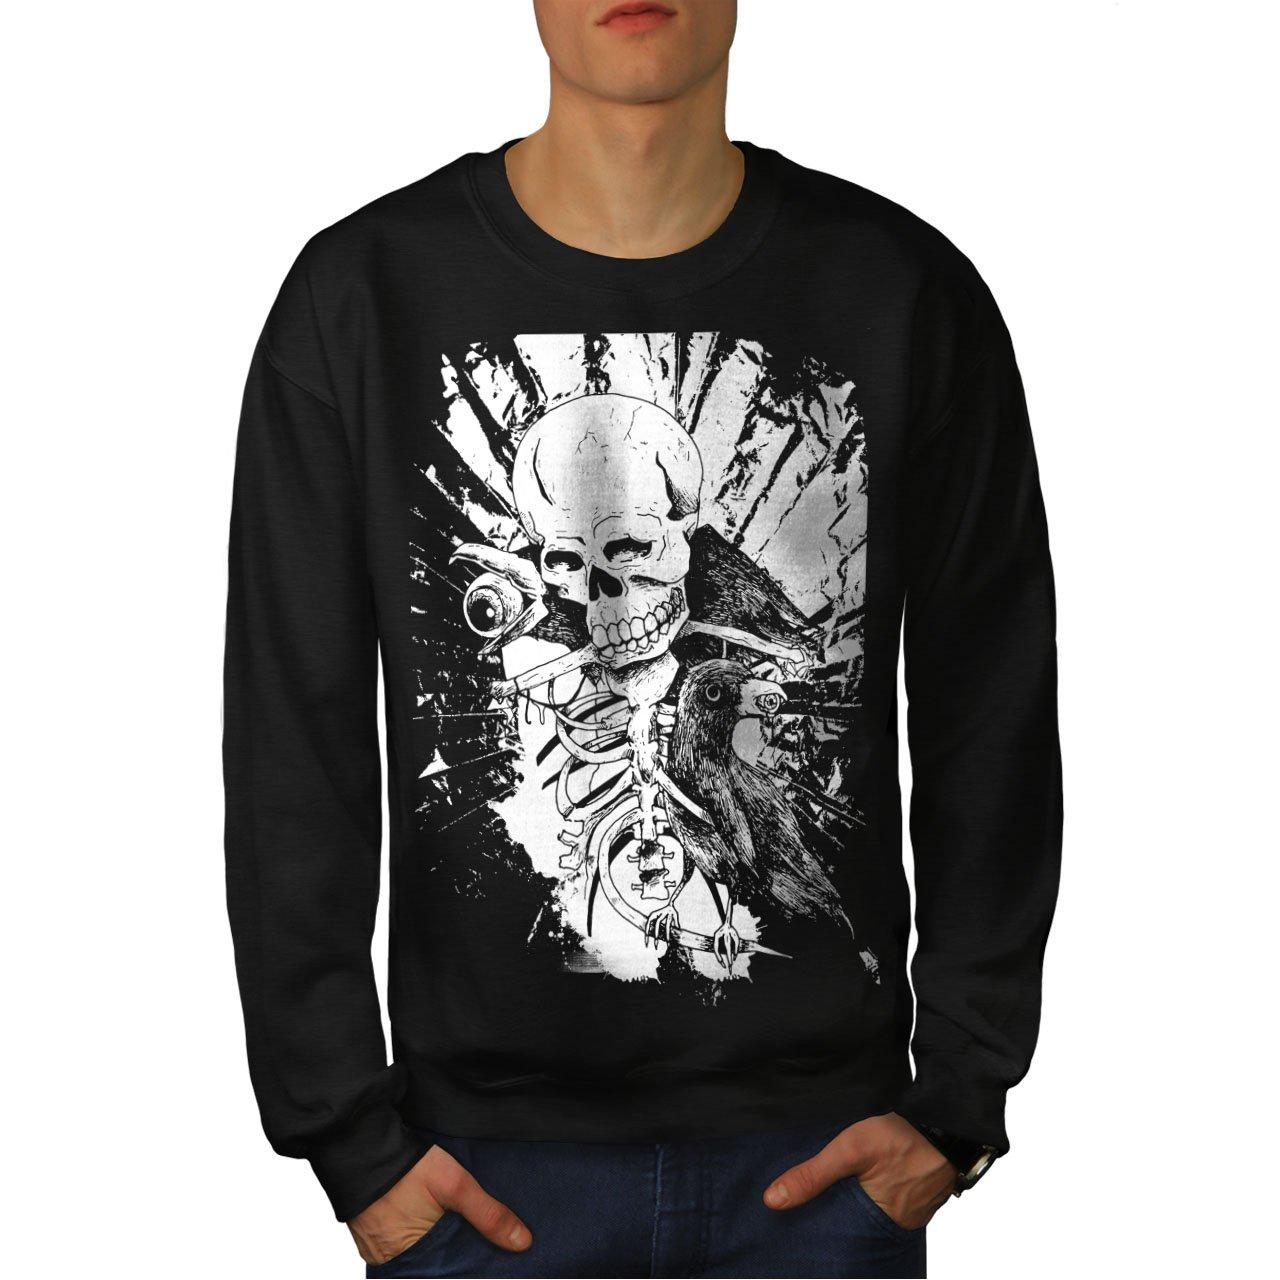 wellcoda Rock Skull Raven Mens Sweatshirt Horror Casual Jumper